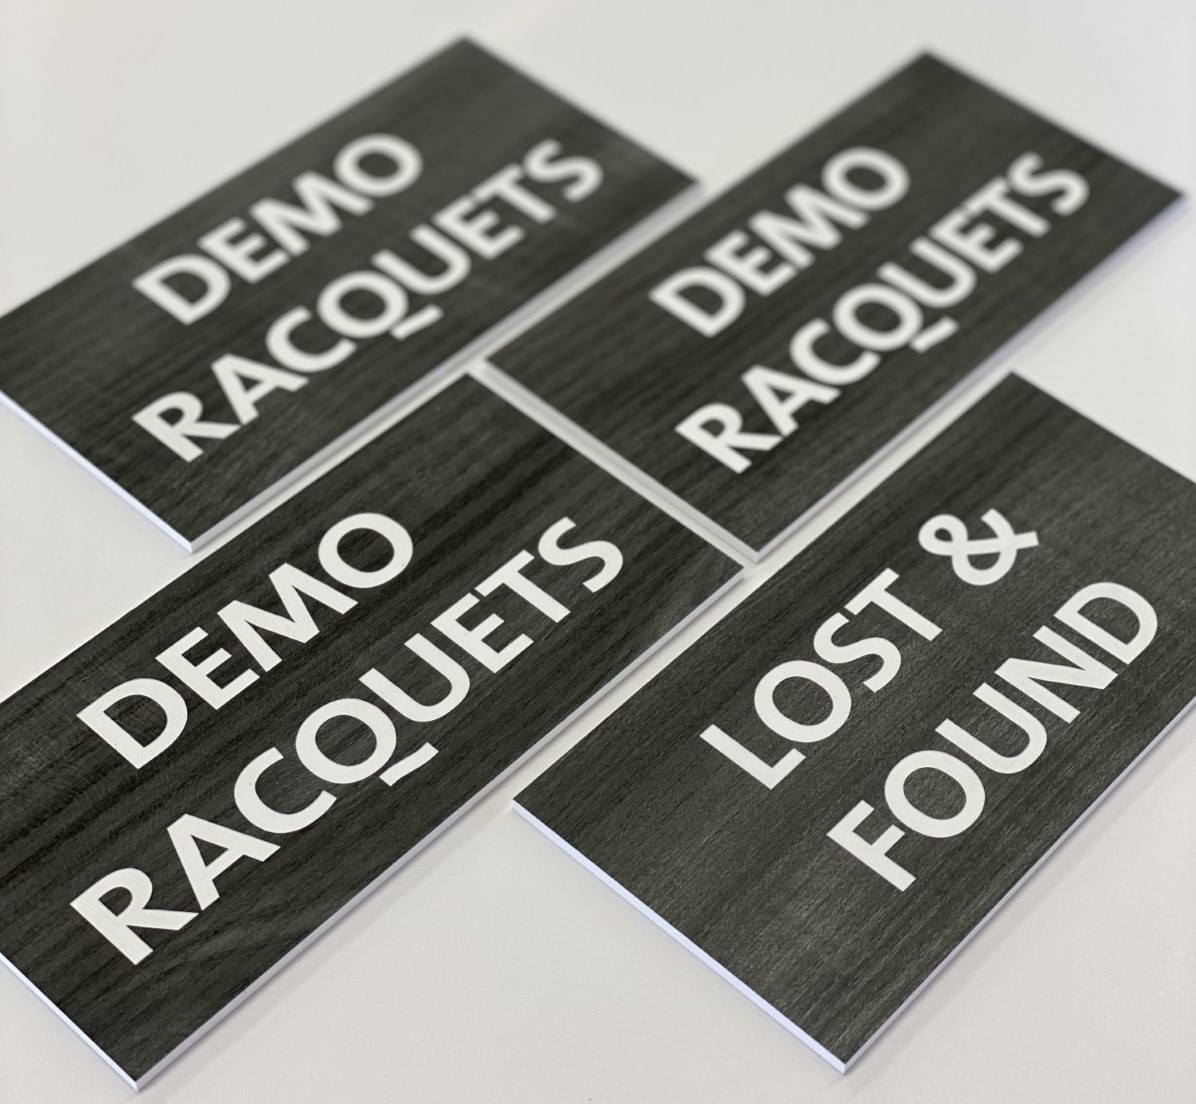 Demo Racquets ADA Signage